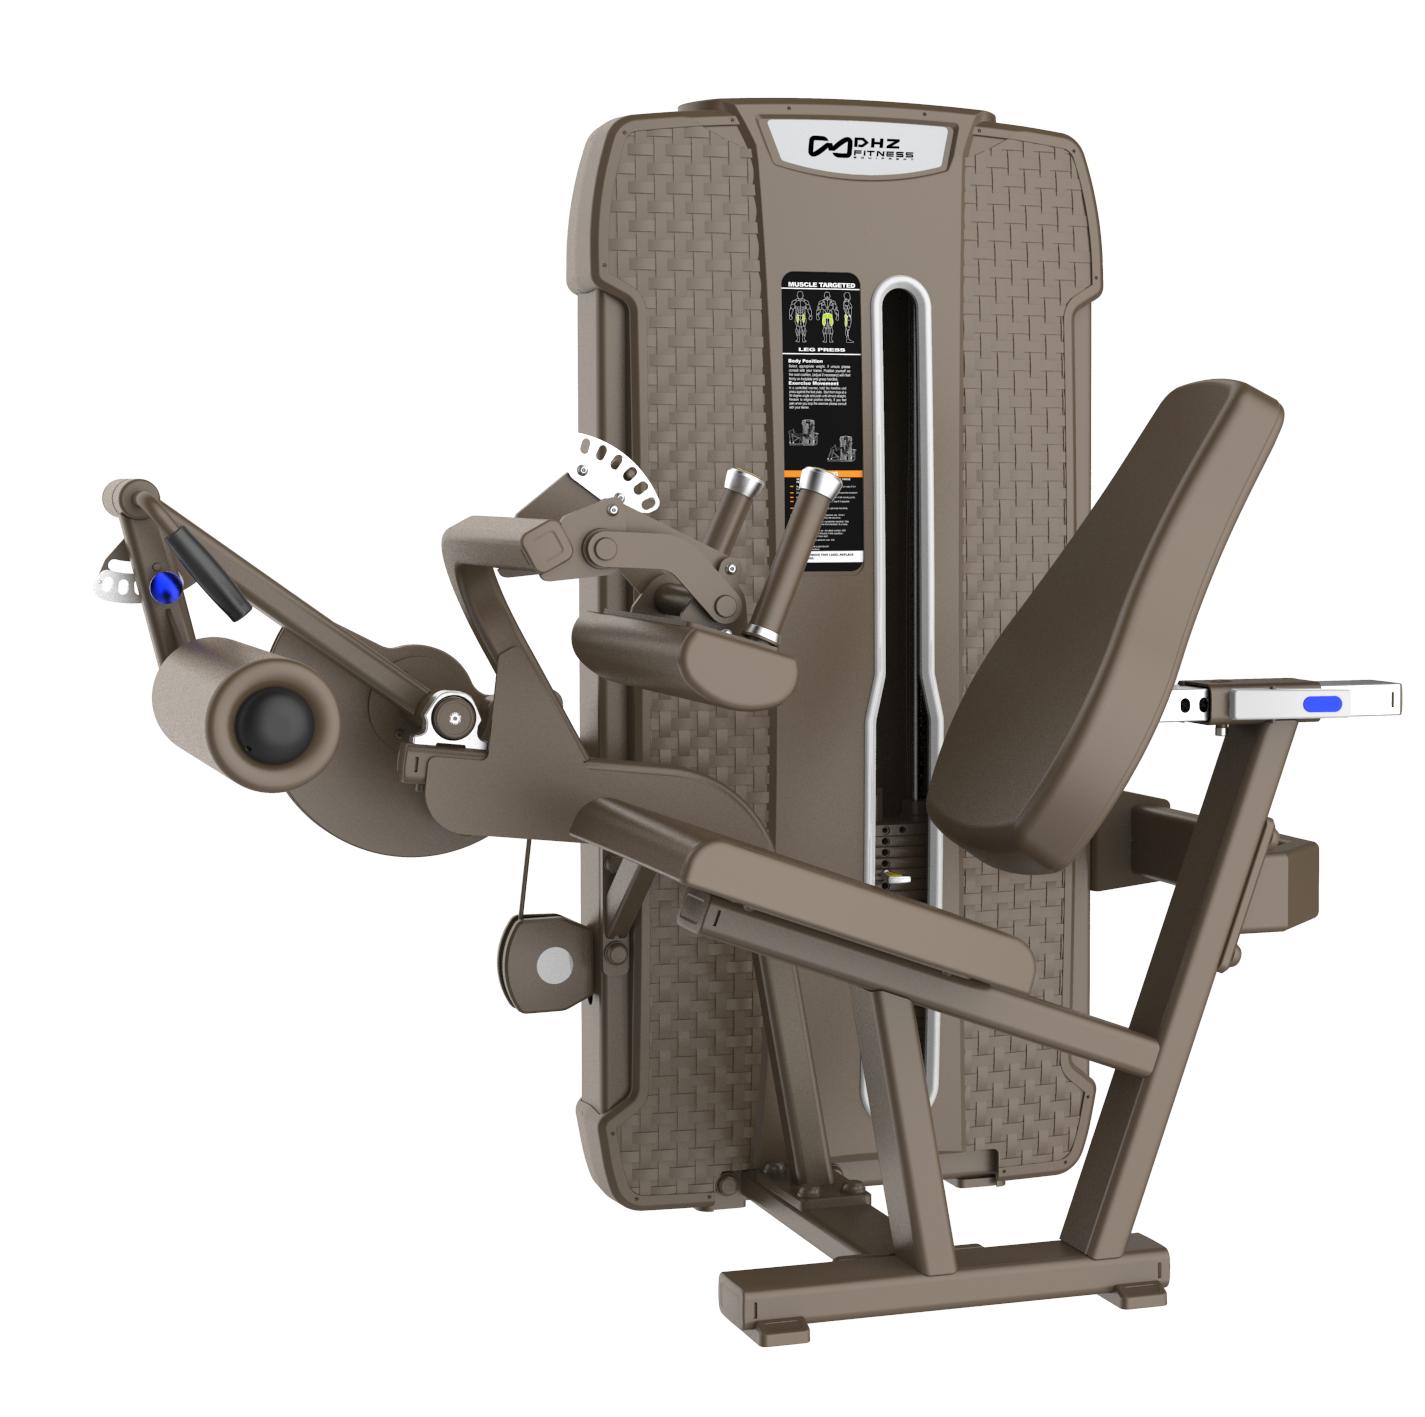 S-4023 Сгибание ног сидя (Seated Leg Cur). Стек 135 кг.